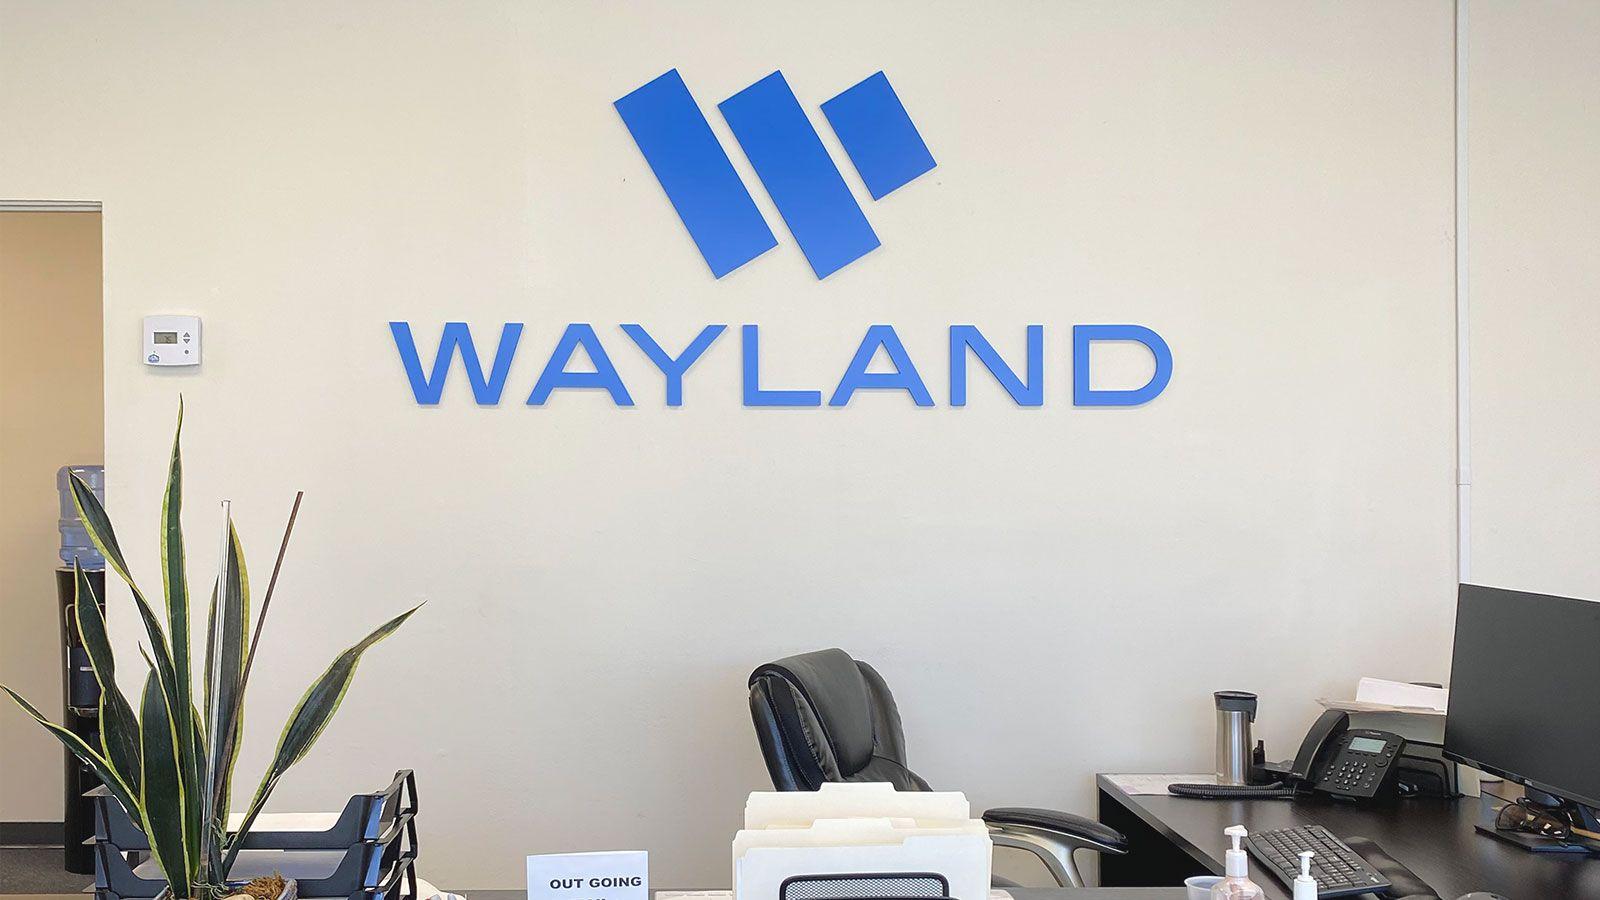 wayland reception sign